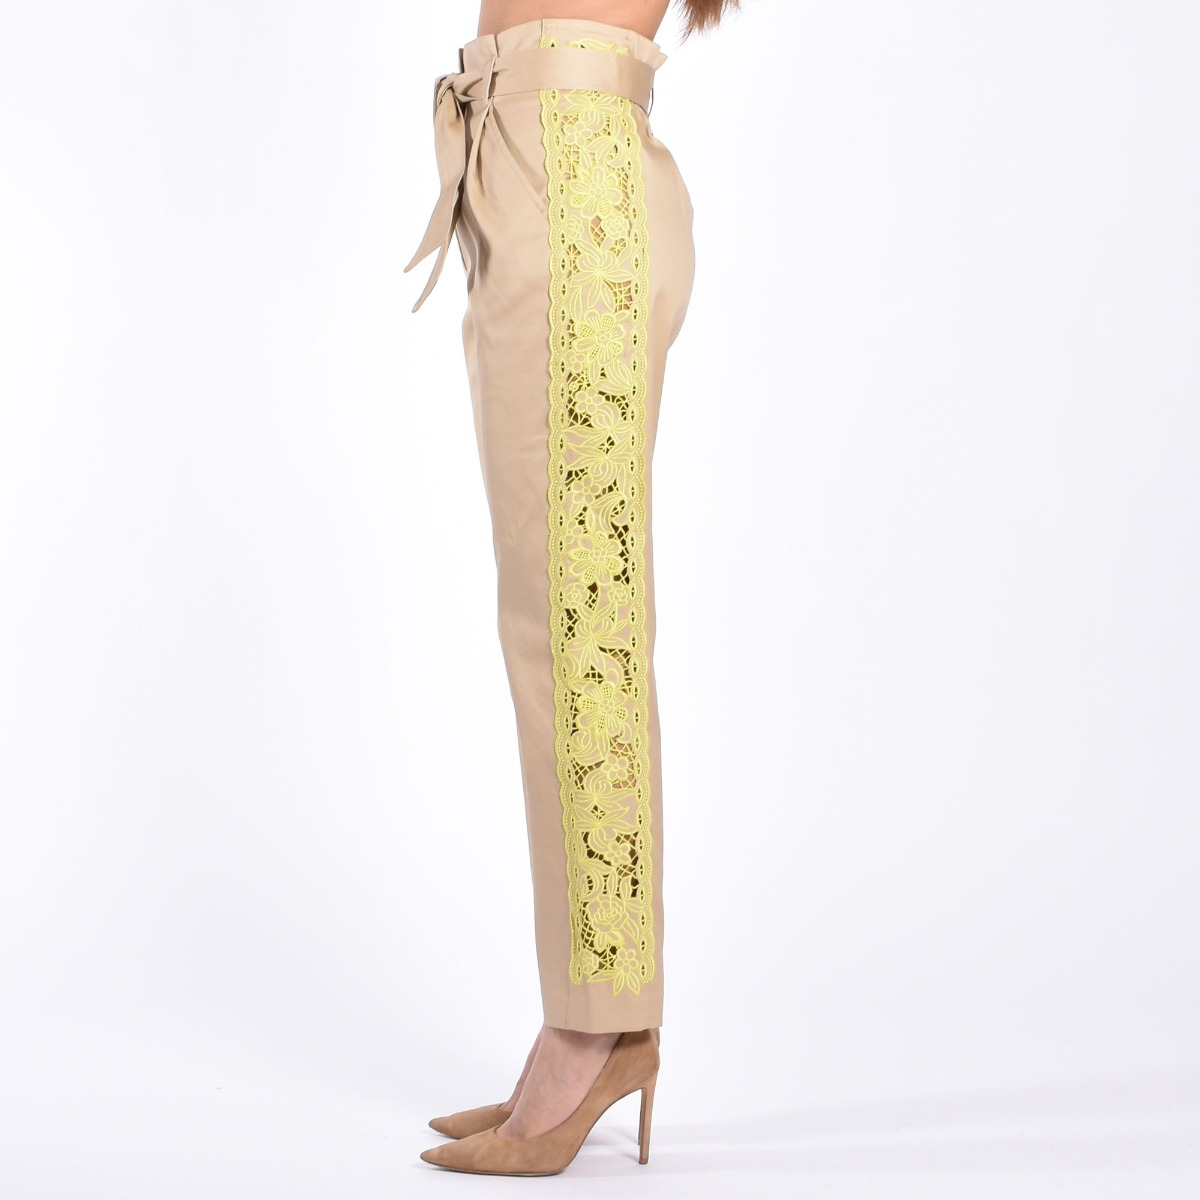 Pantalone inserto fluo- Sabbia